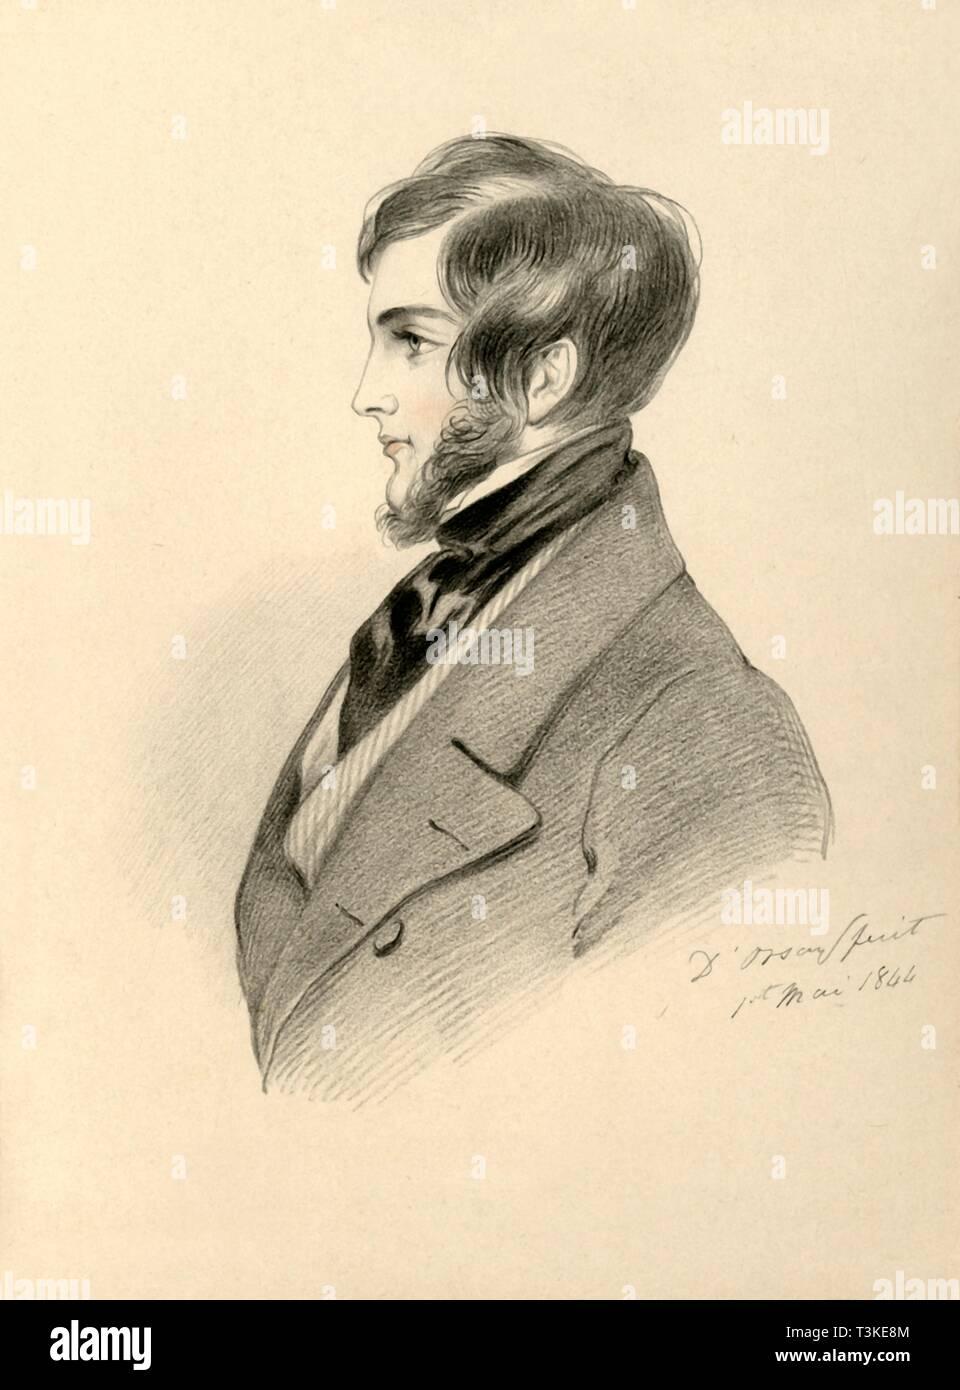 'Frank Sheridan', 1844. Creator: Richard James Lane. - Stock Image